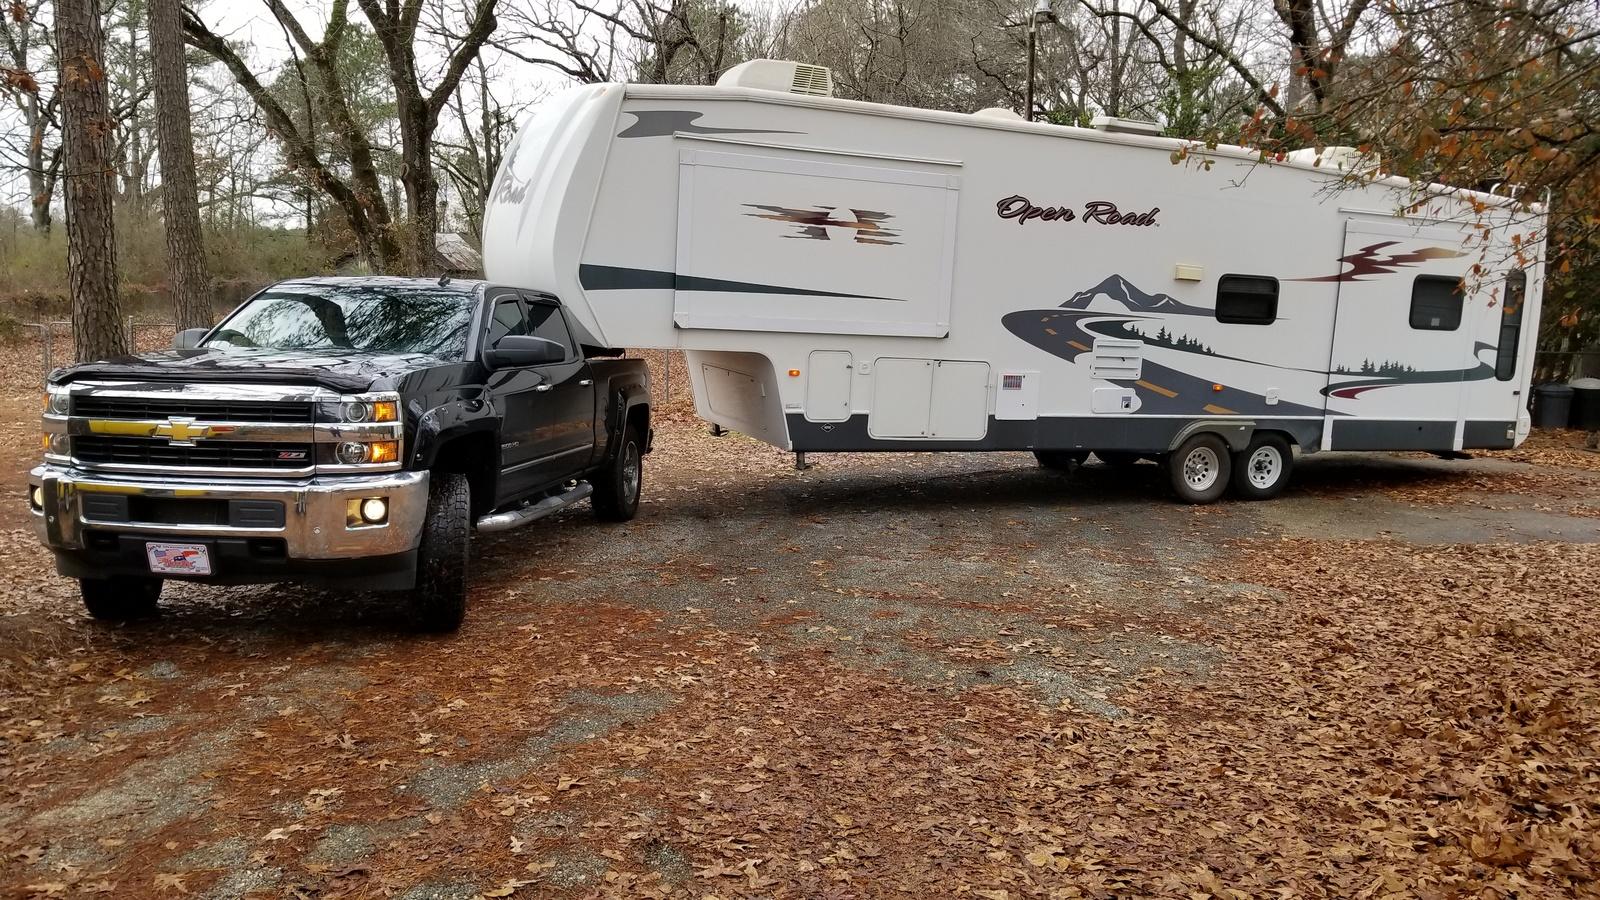 Chevrolet Silverado 2500hd Questions I Purchased A 34 Ft 5th Wheel